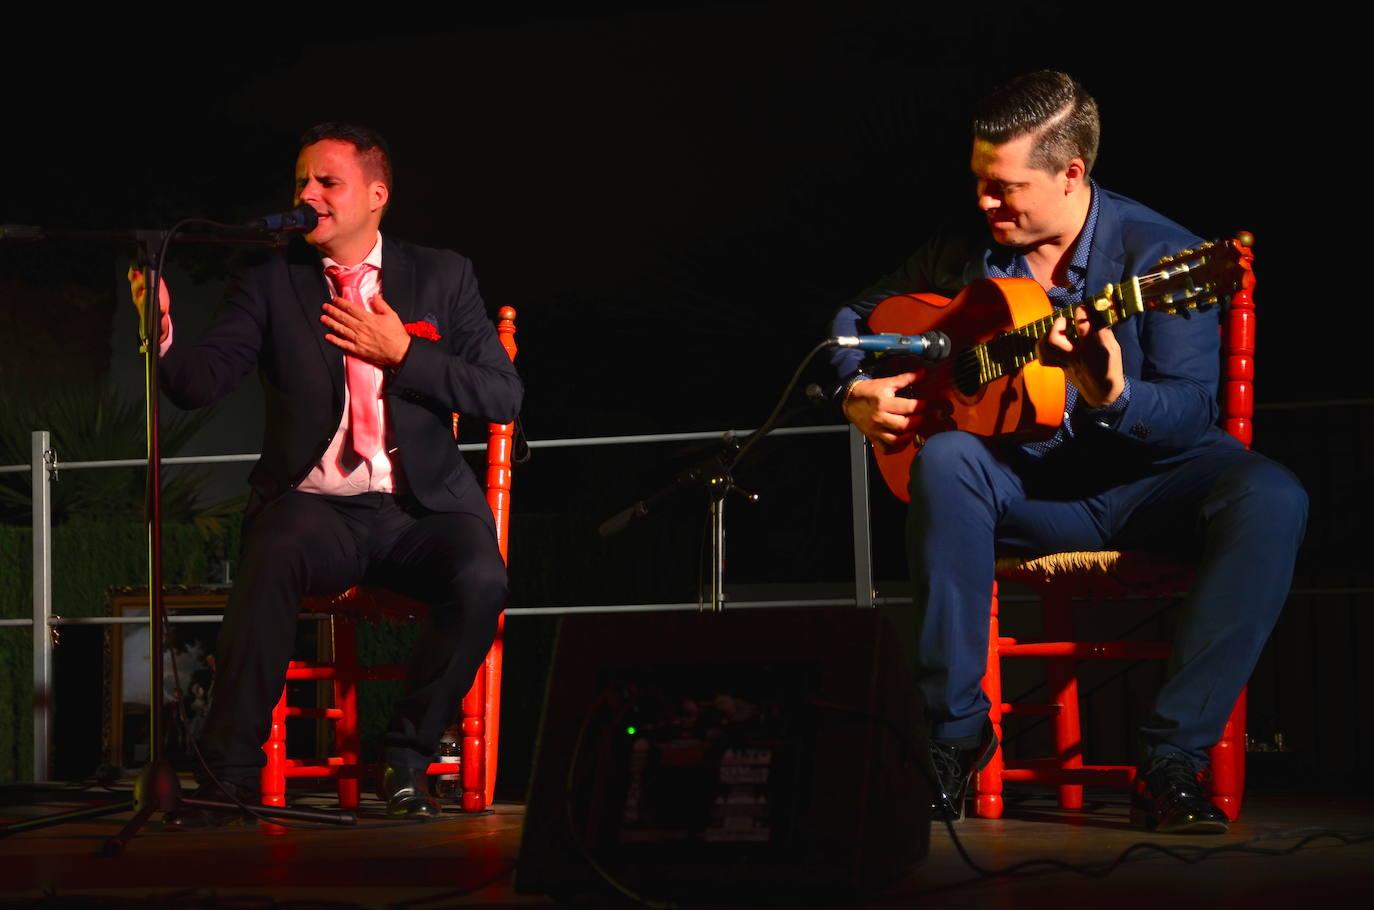 Así fue el Festival Flamenco de Huétor Vega de 2021